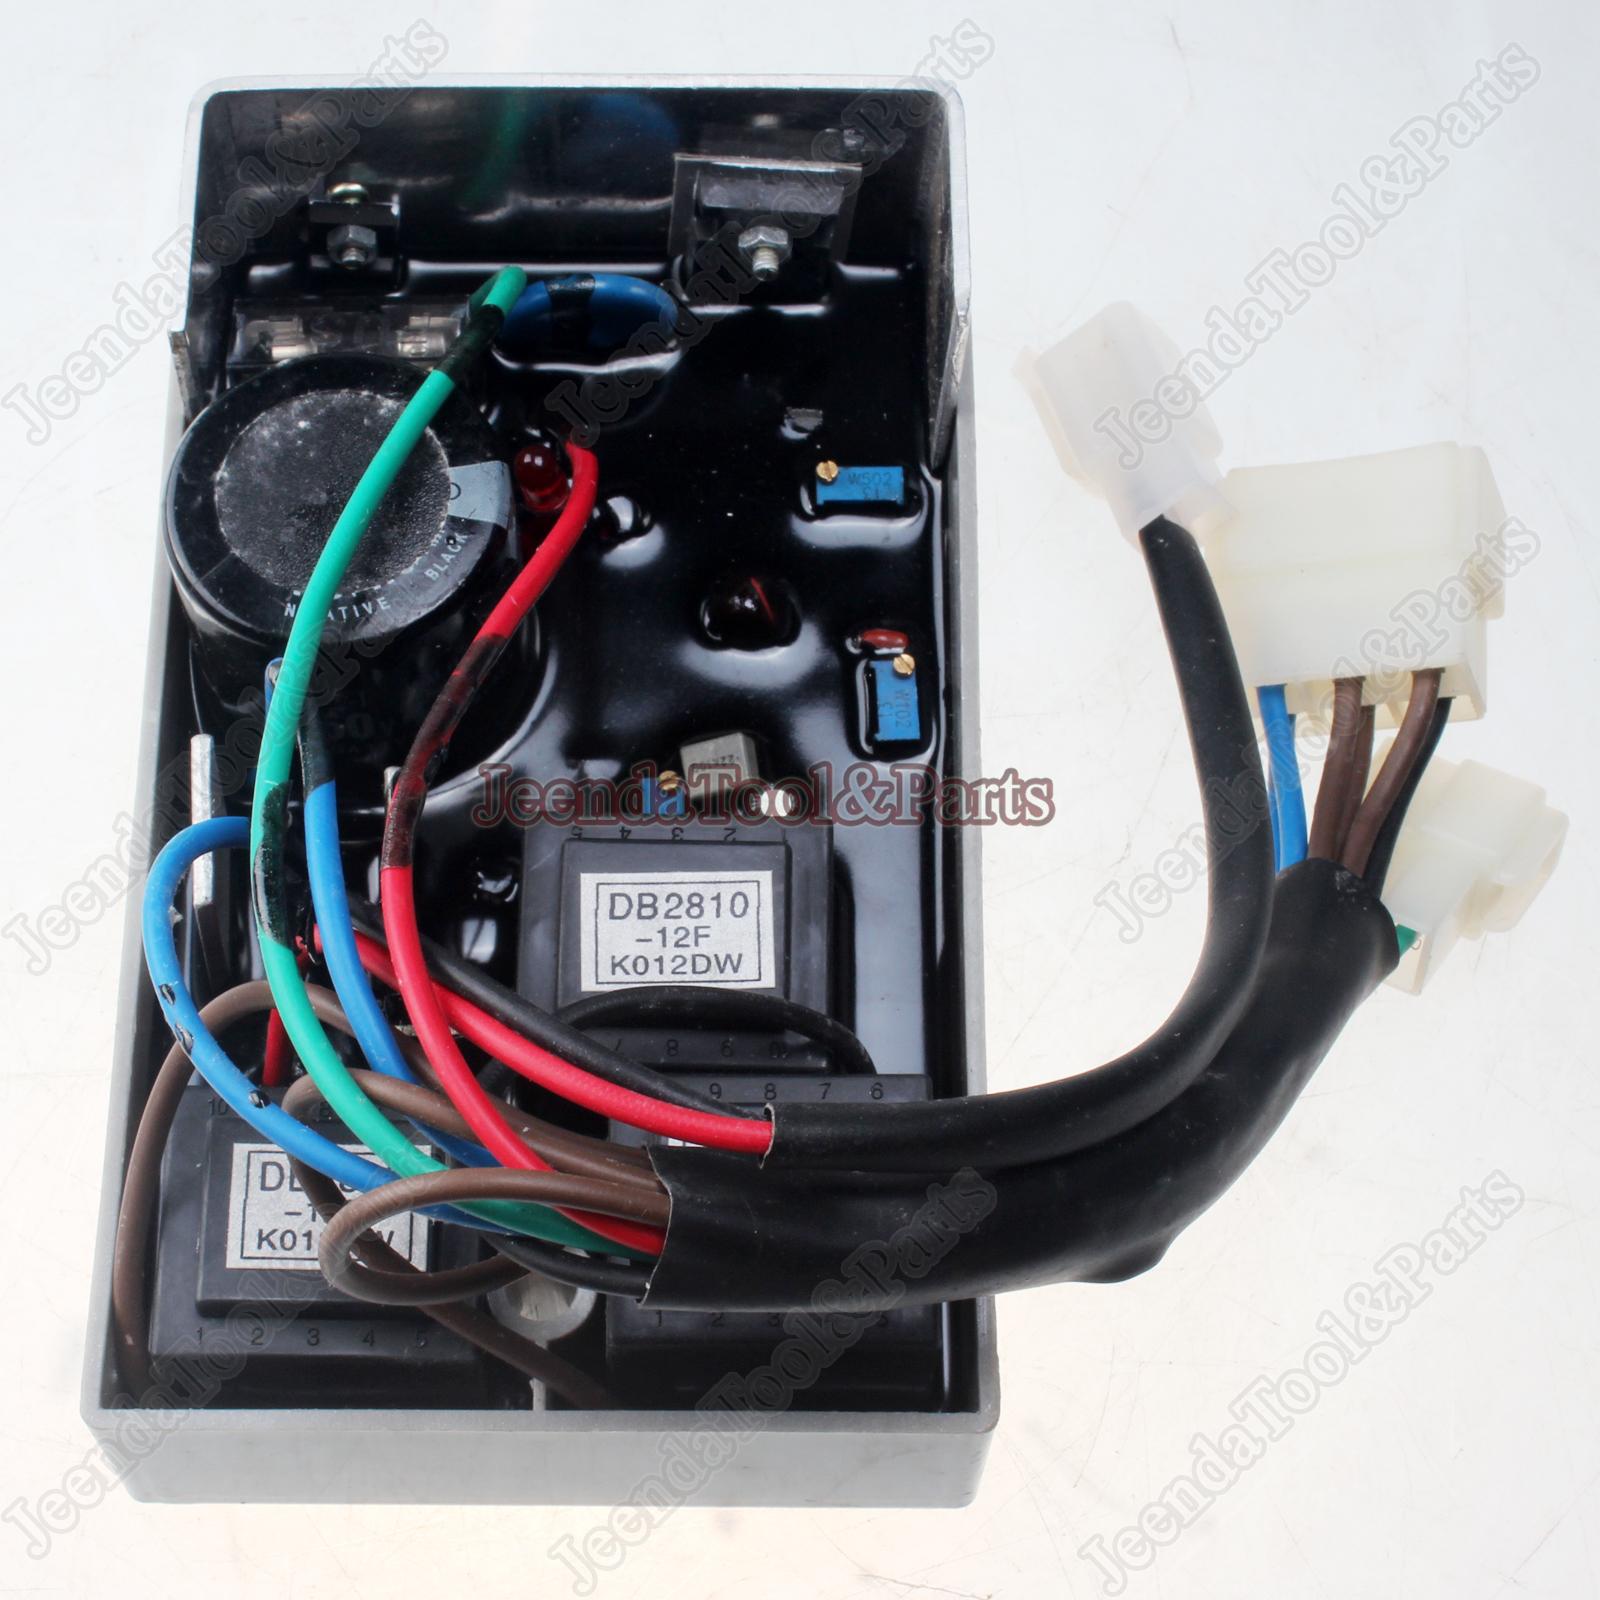 New Voltage Regulator 10KW AVR KI DAVR 95S3 for KIPOR 3 Phase